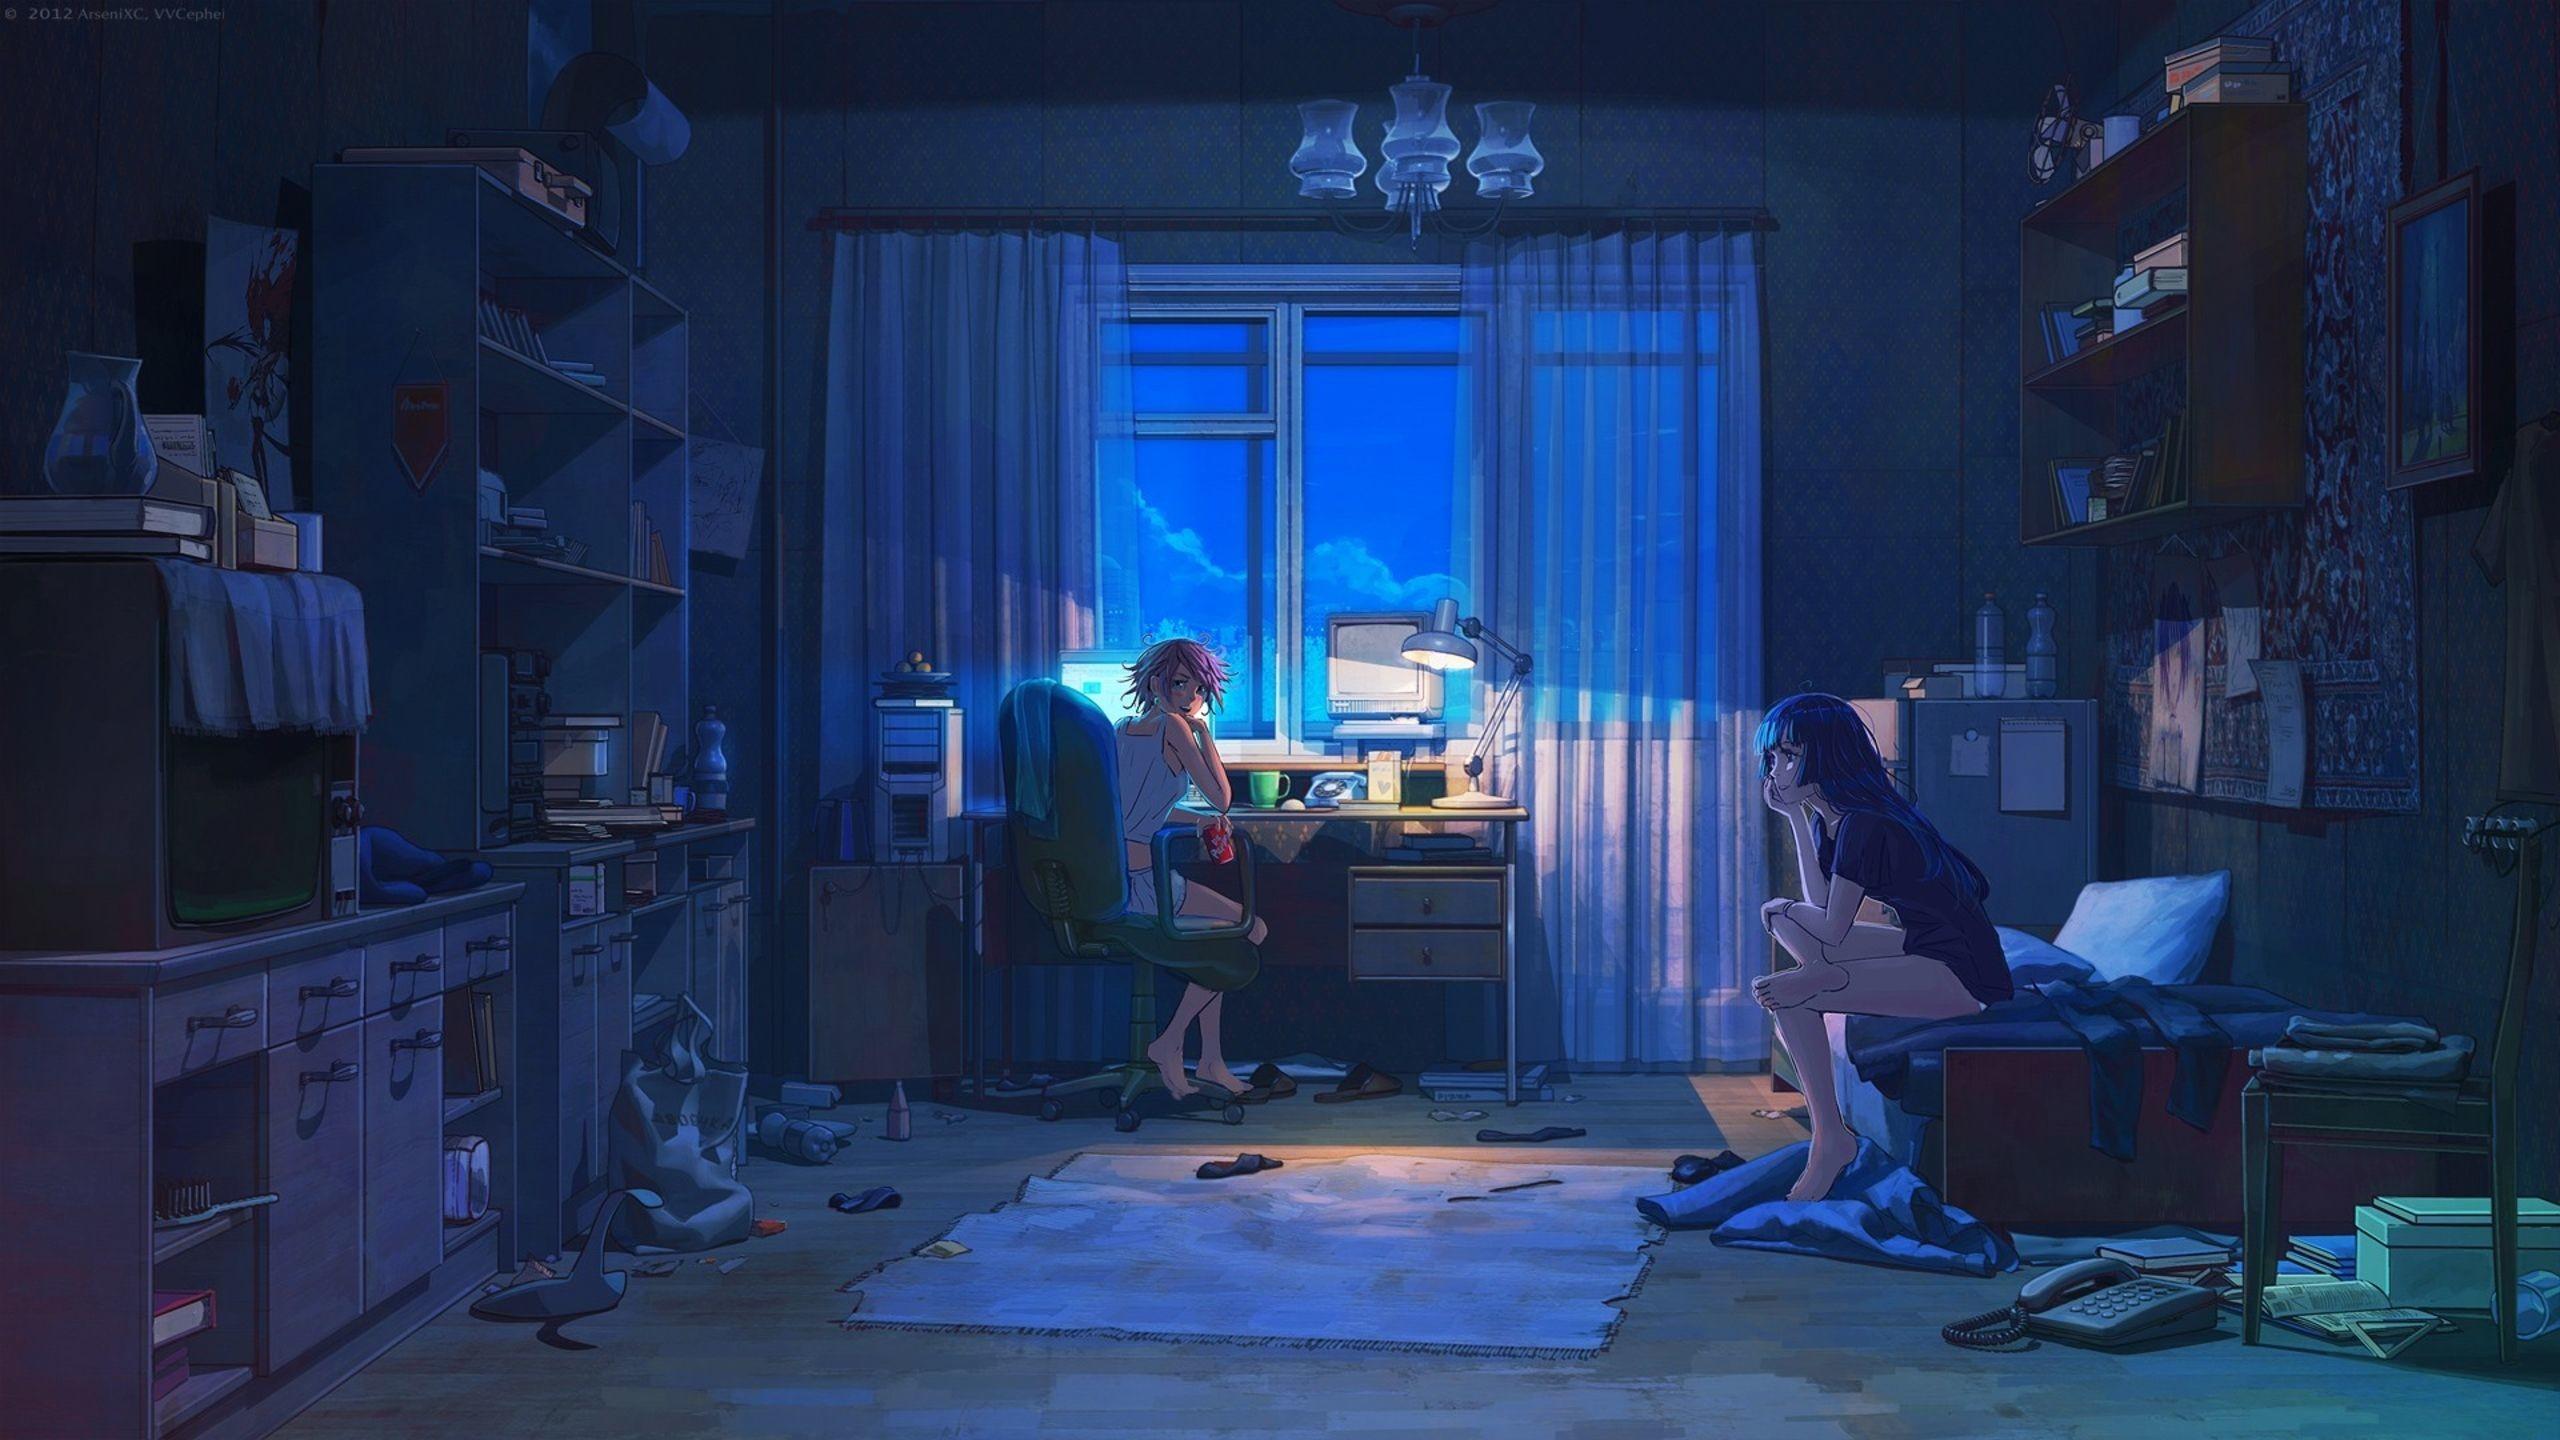 Fantasy anime wallpaper, 2560×1440